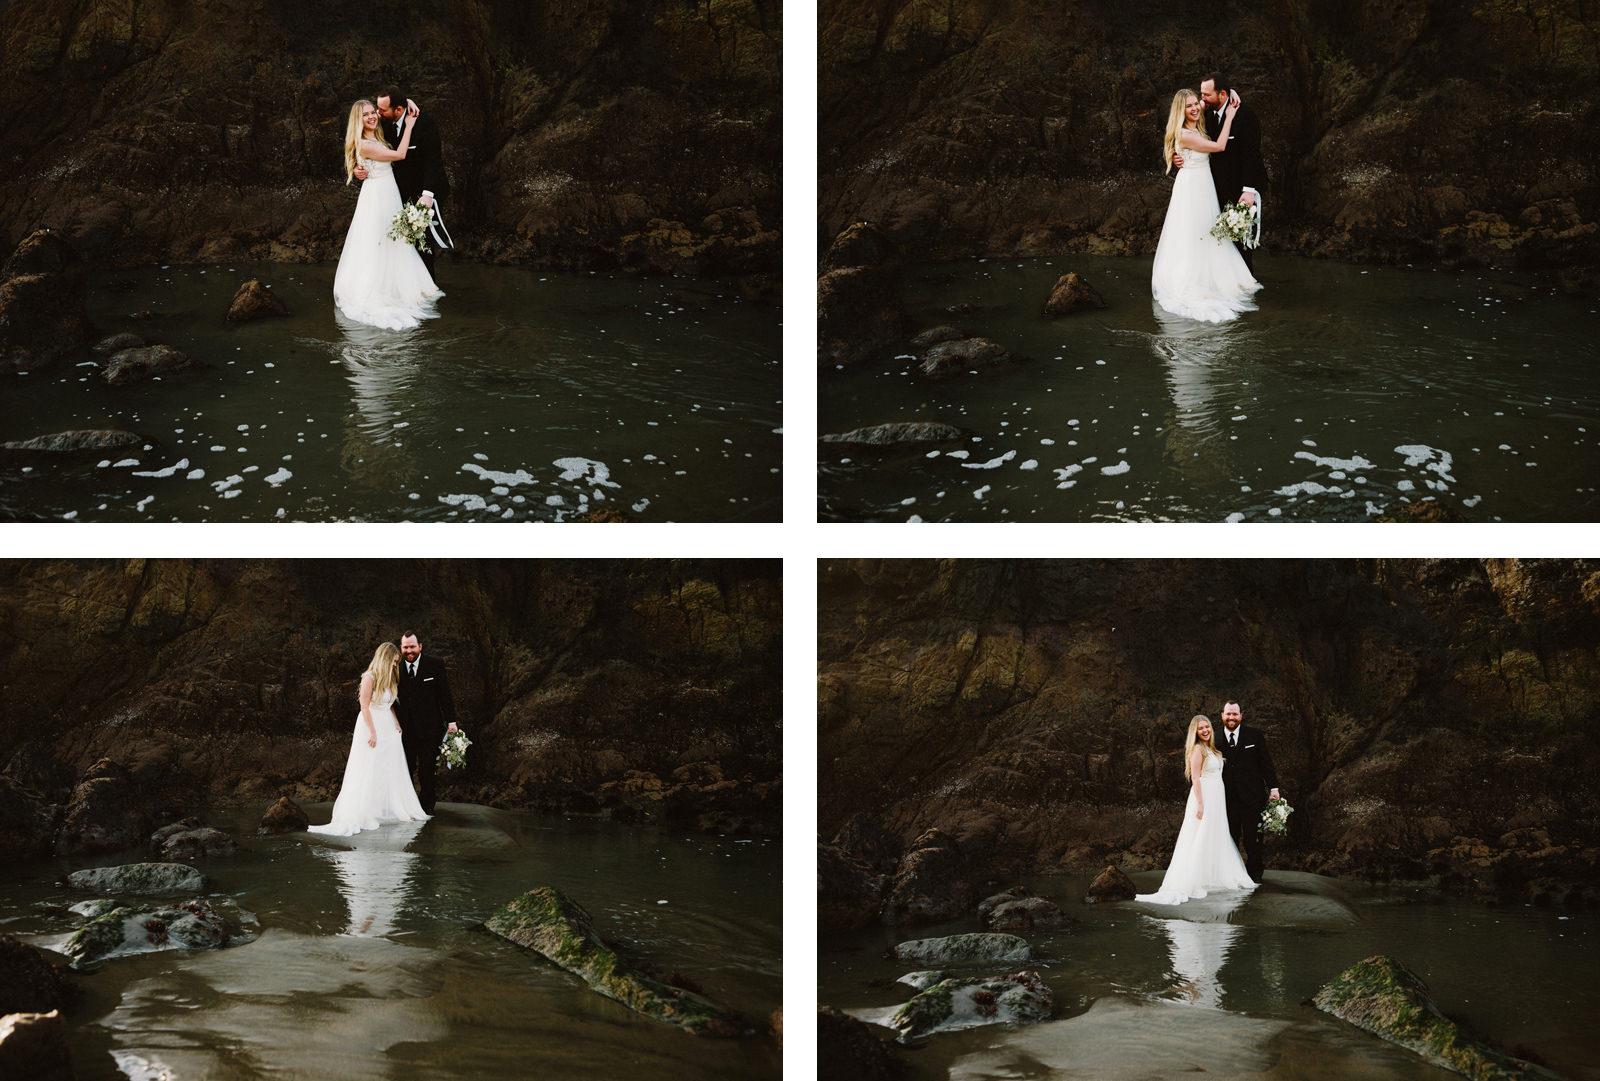 san-francisco-city-hall-elopement-52 SAN FRANCISCO CITY HALL INTIMATE WEDDING